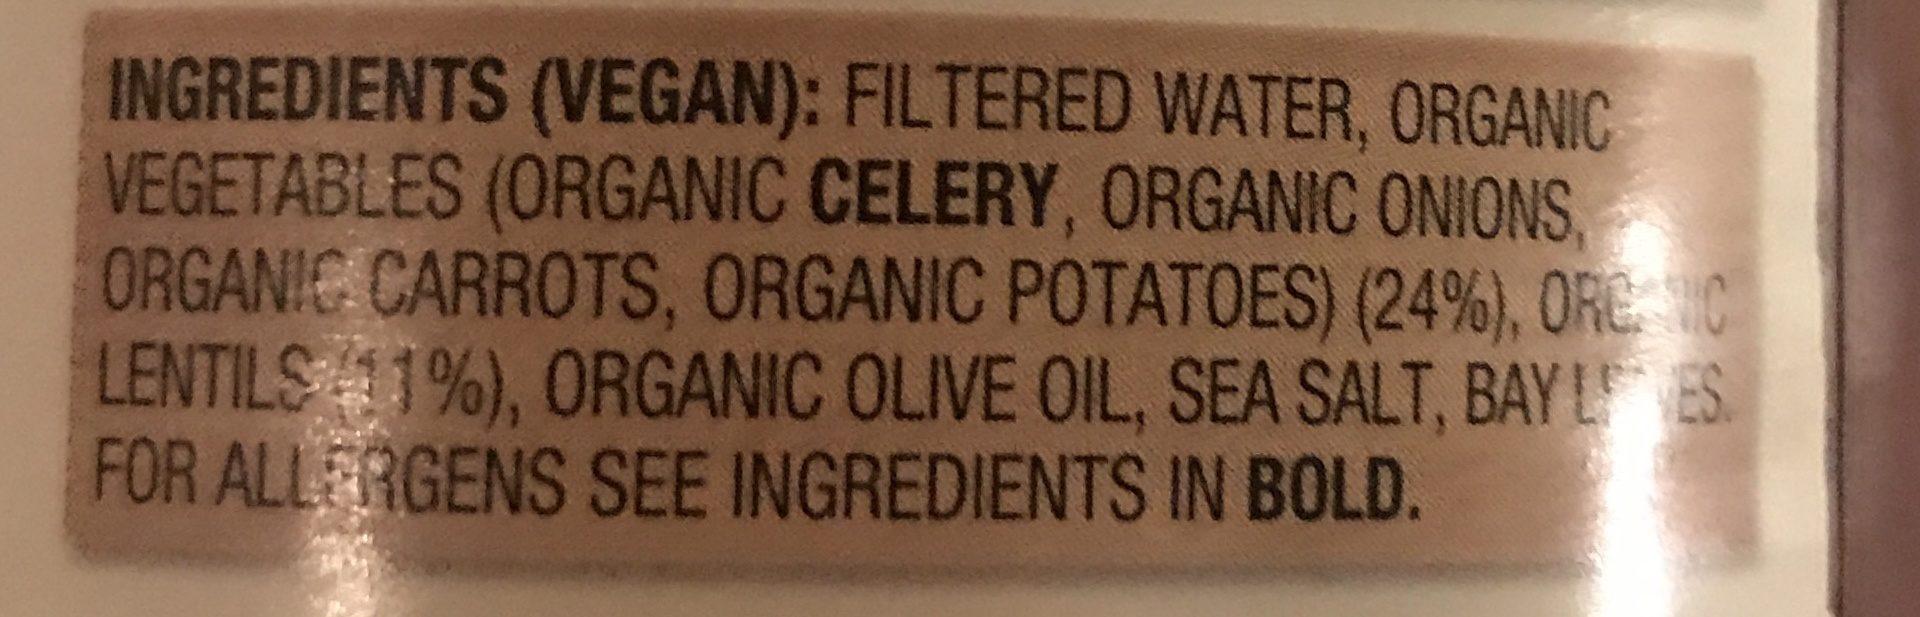 Organic Lentil Soup - Ingredients - en